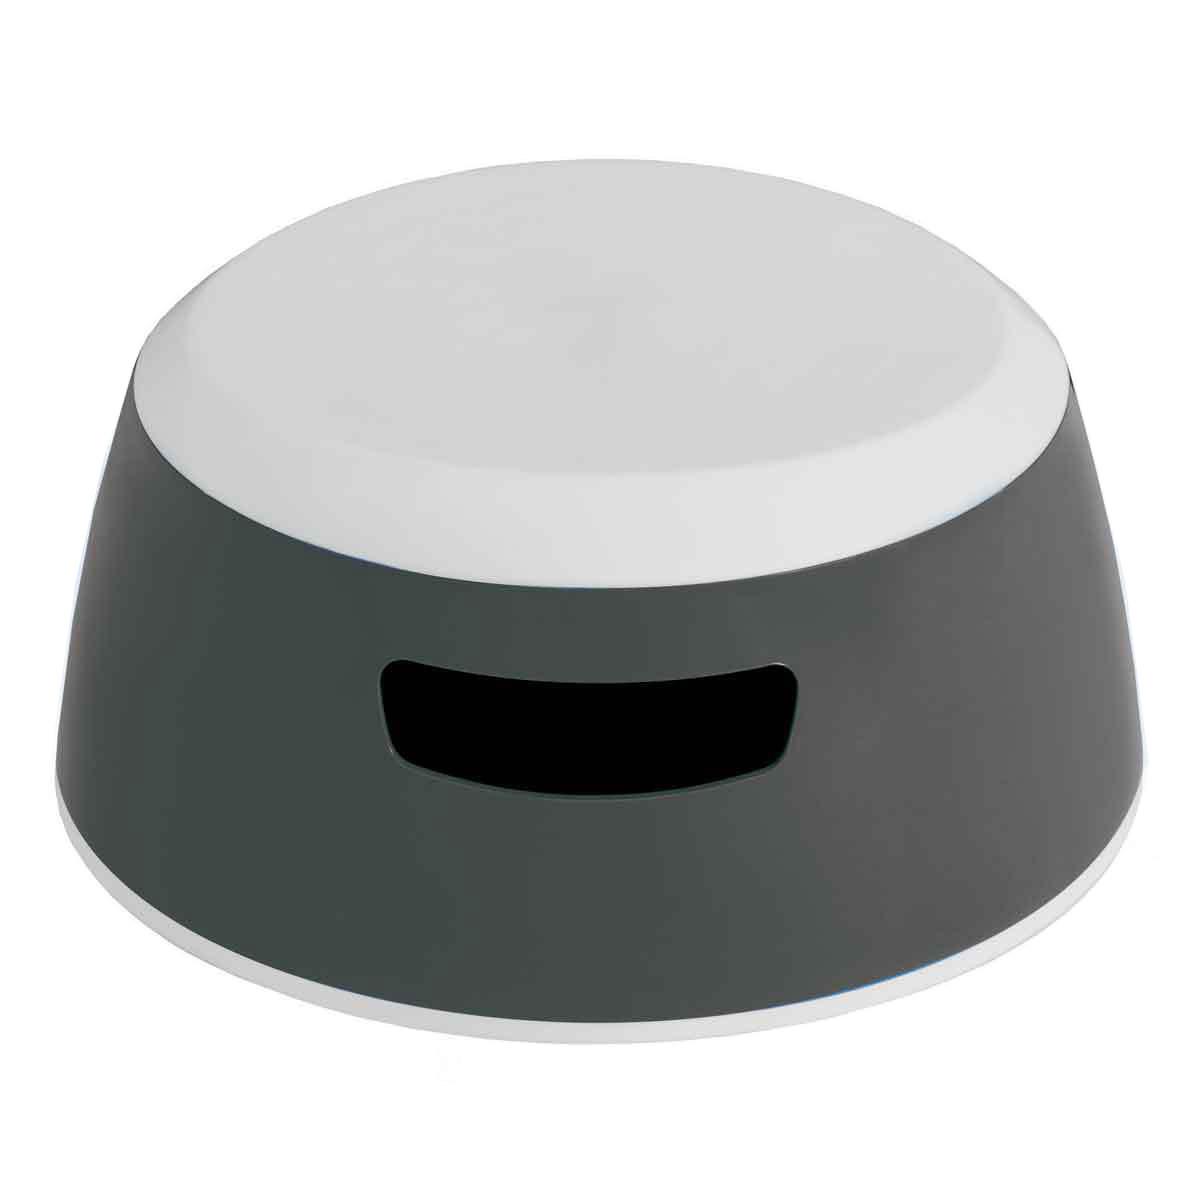 Pot & Réducteur Marchepied - Dark Grey Marchepied - Dark Grey